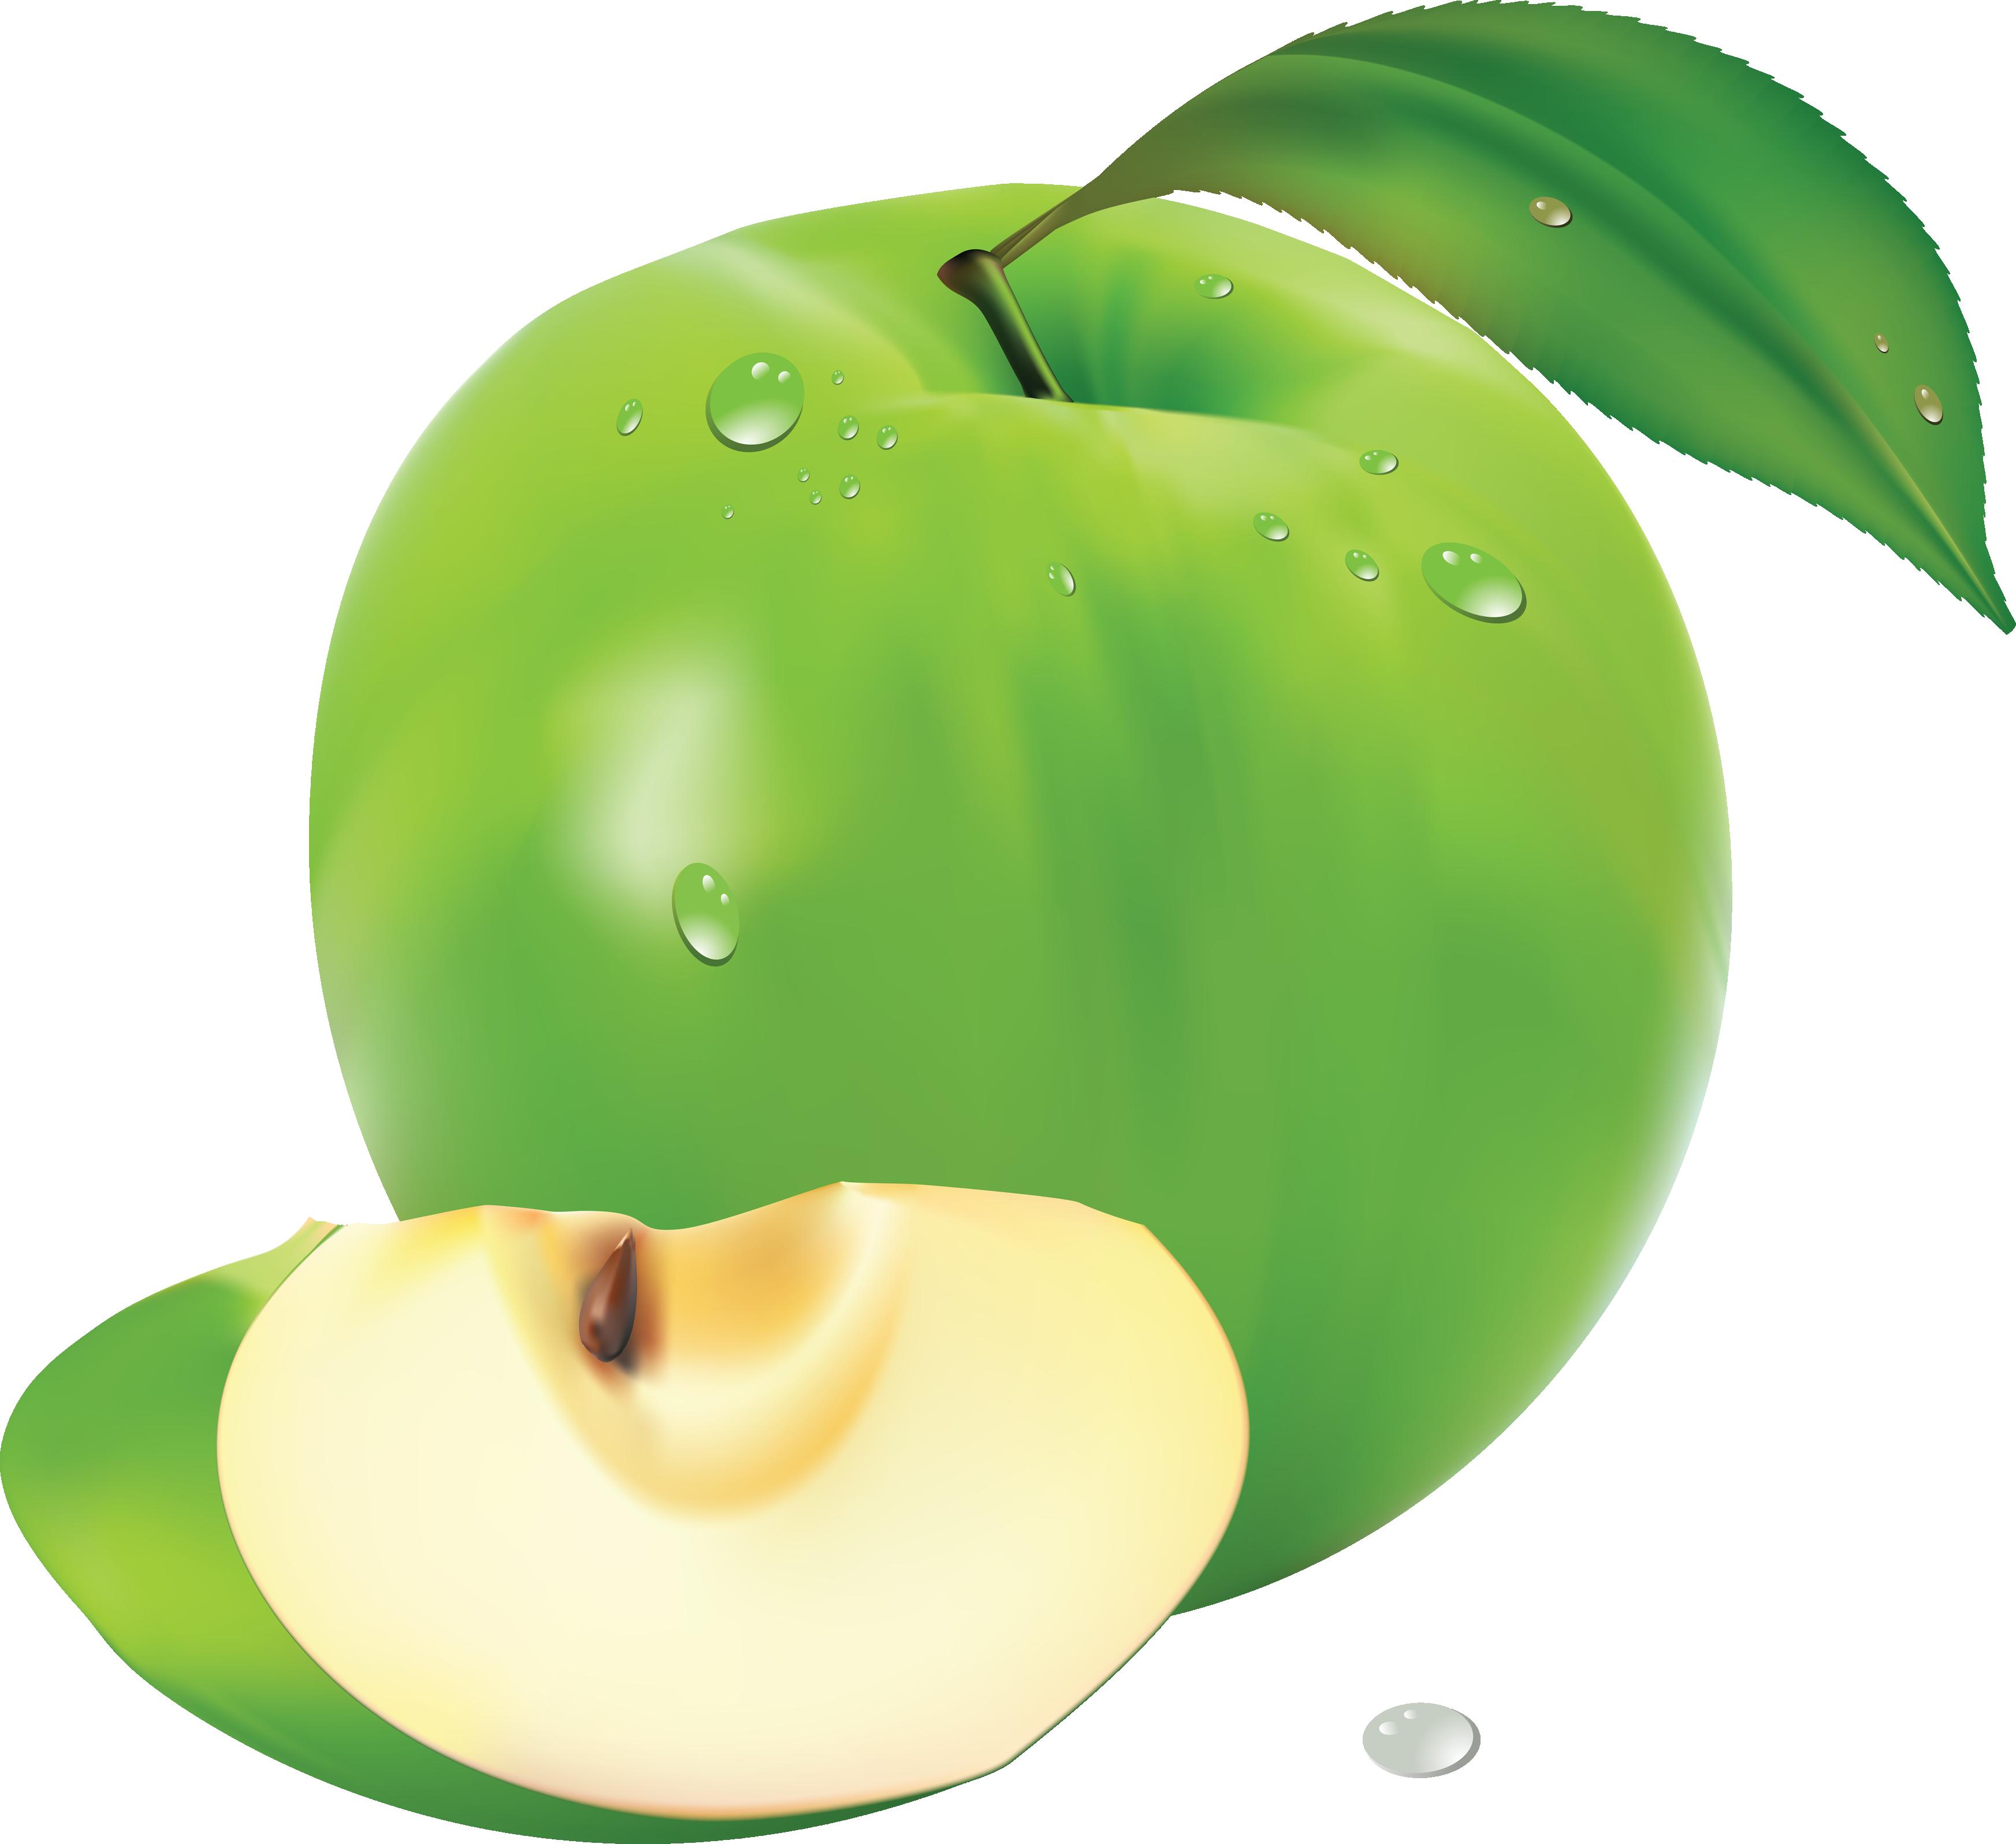 Green Apple S Png Image Green Apple Green Apple